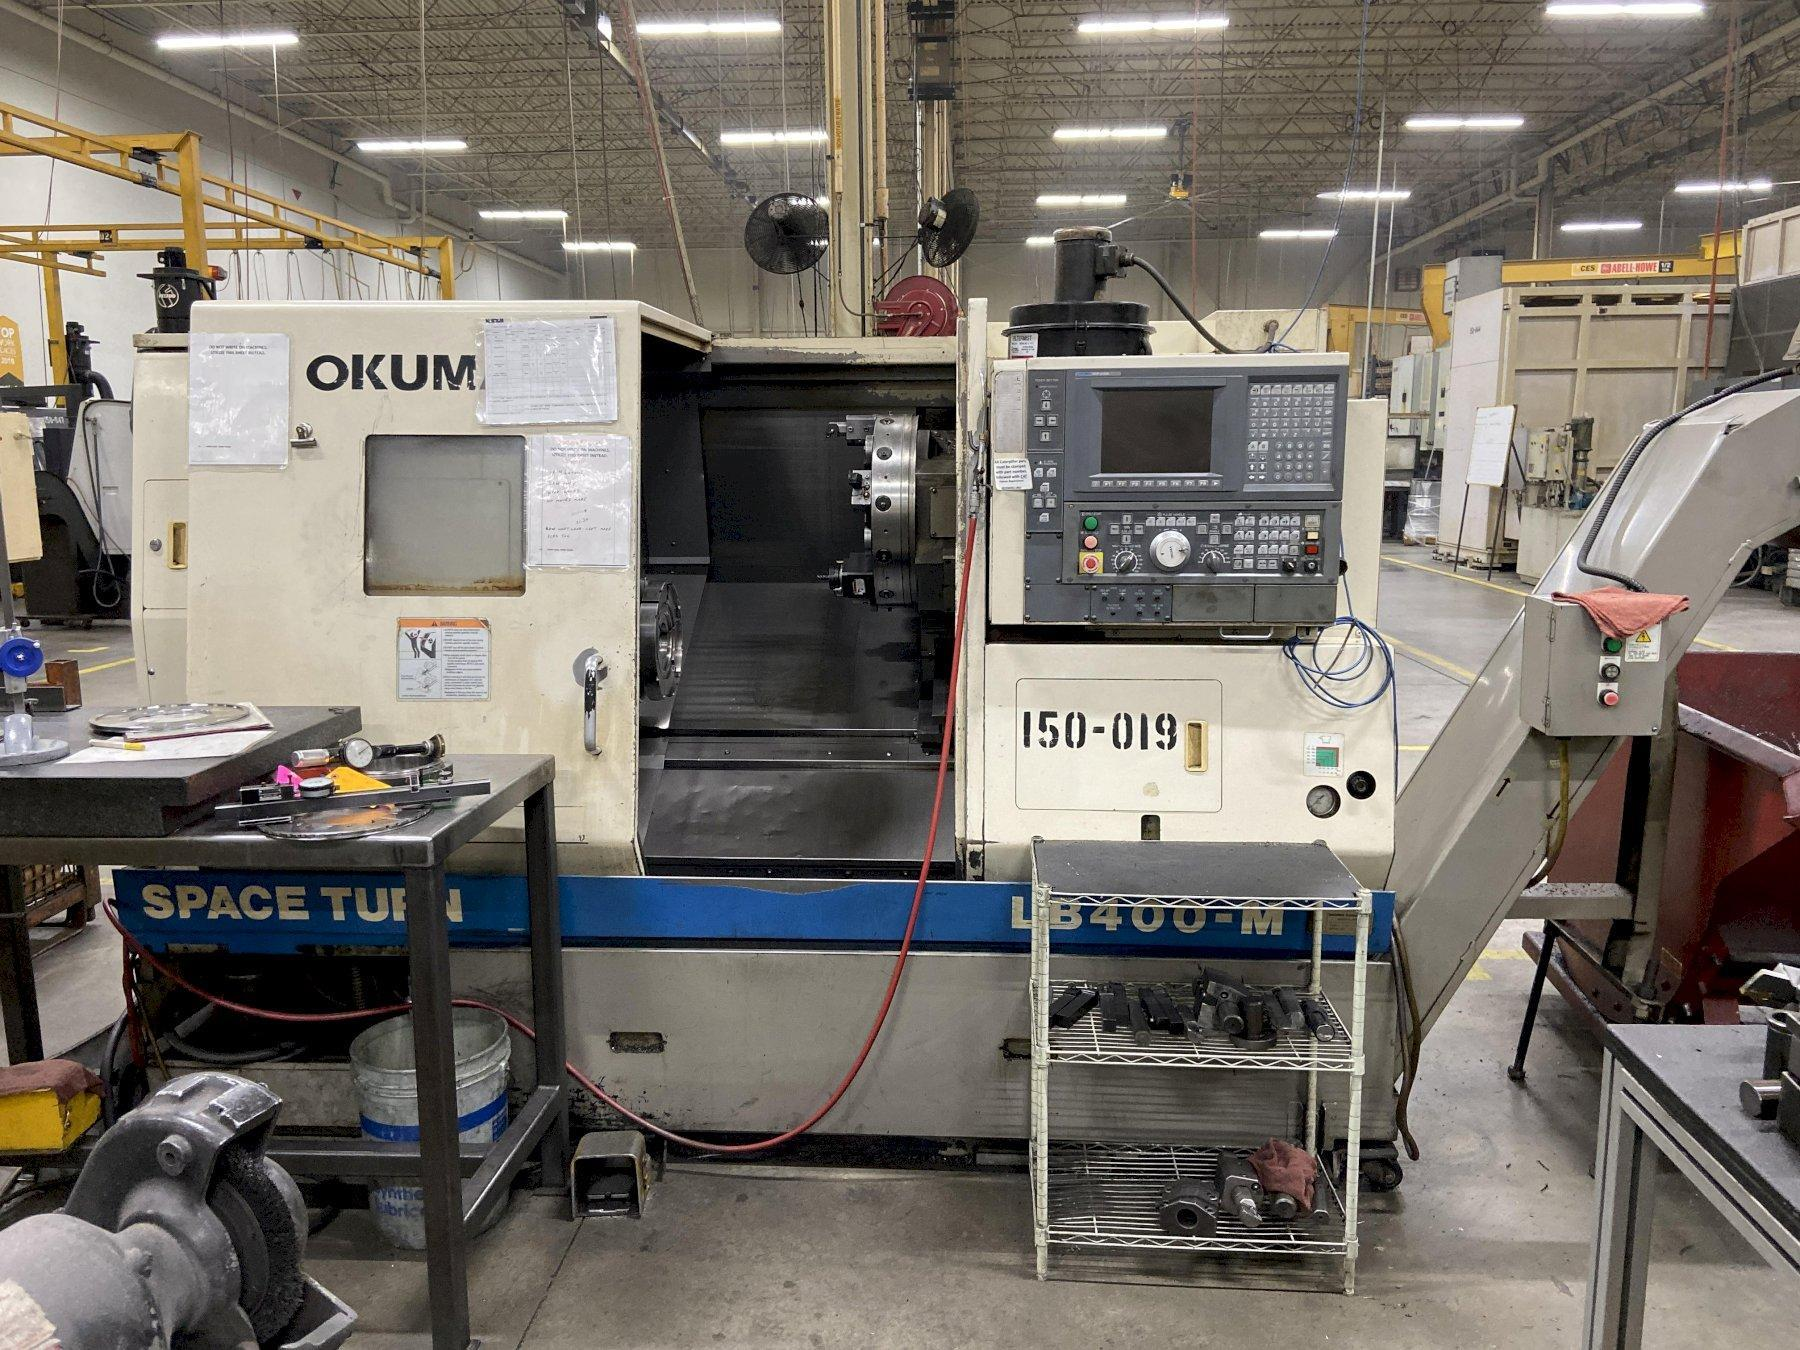 Okuma LB400M CNC Lathe w/Milling, U100L Control, 12